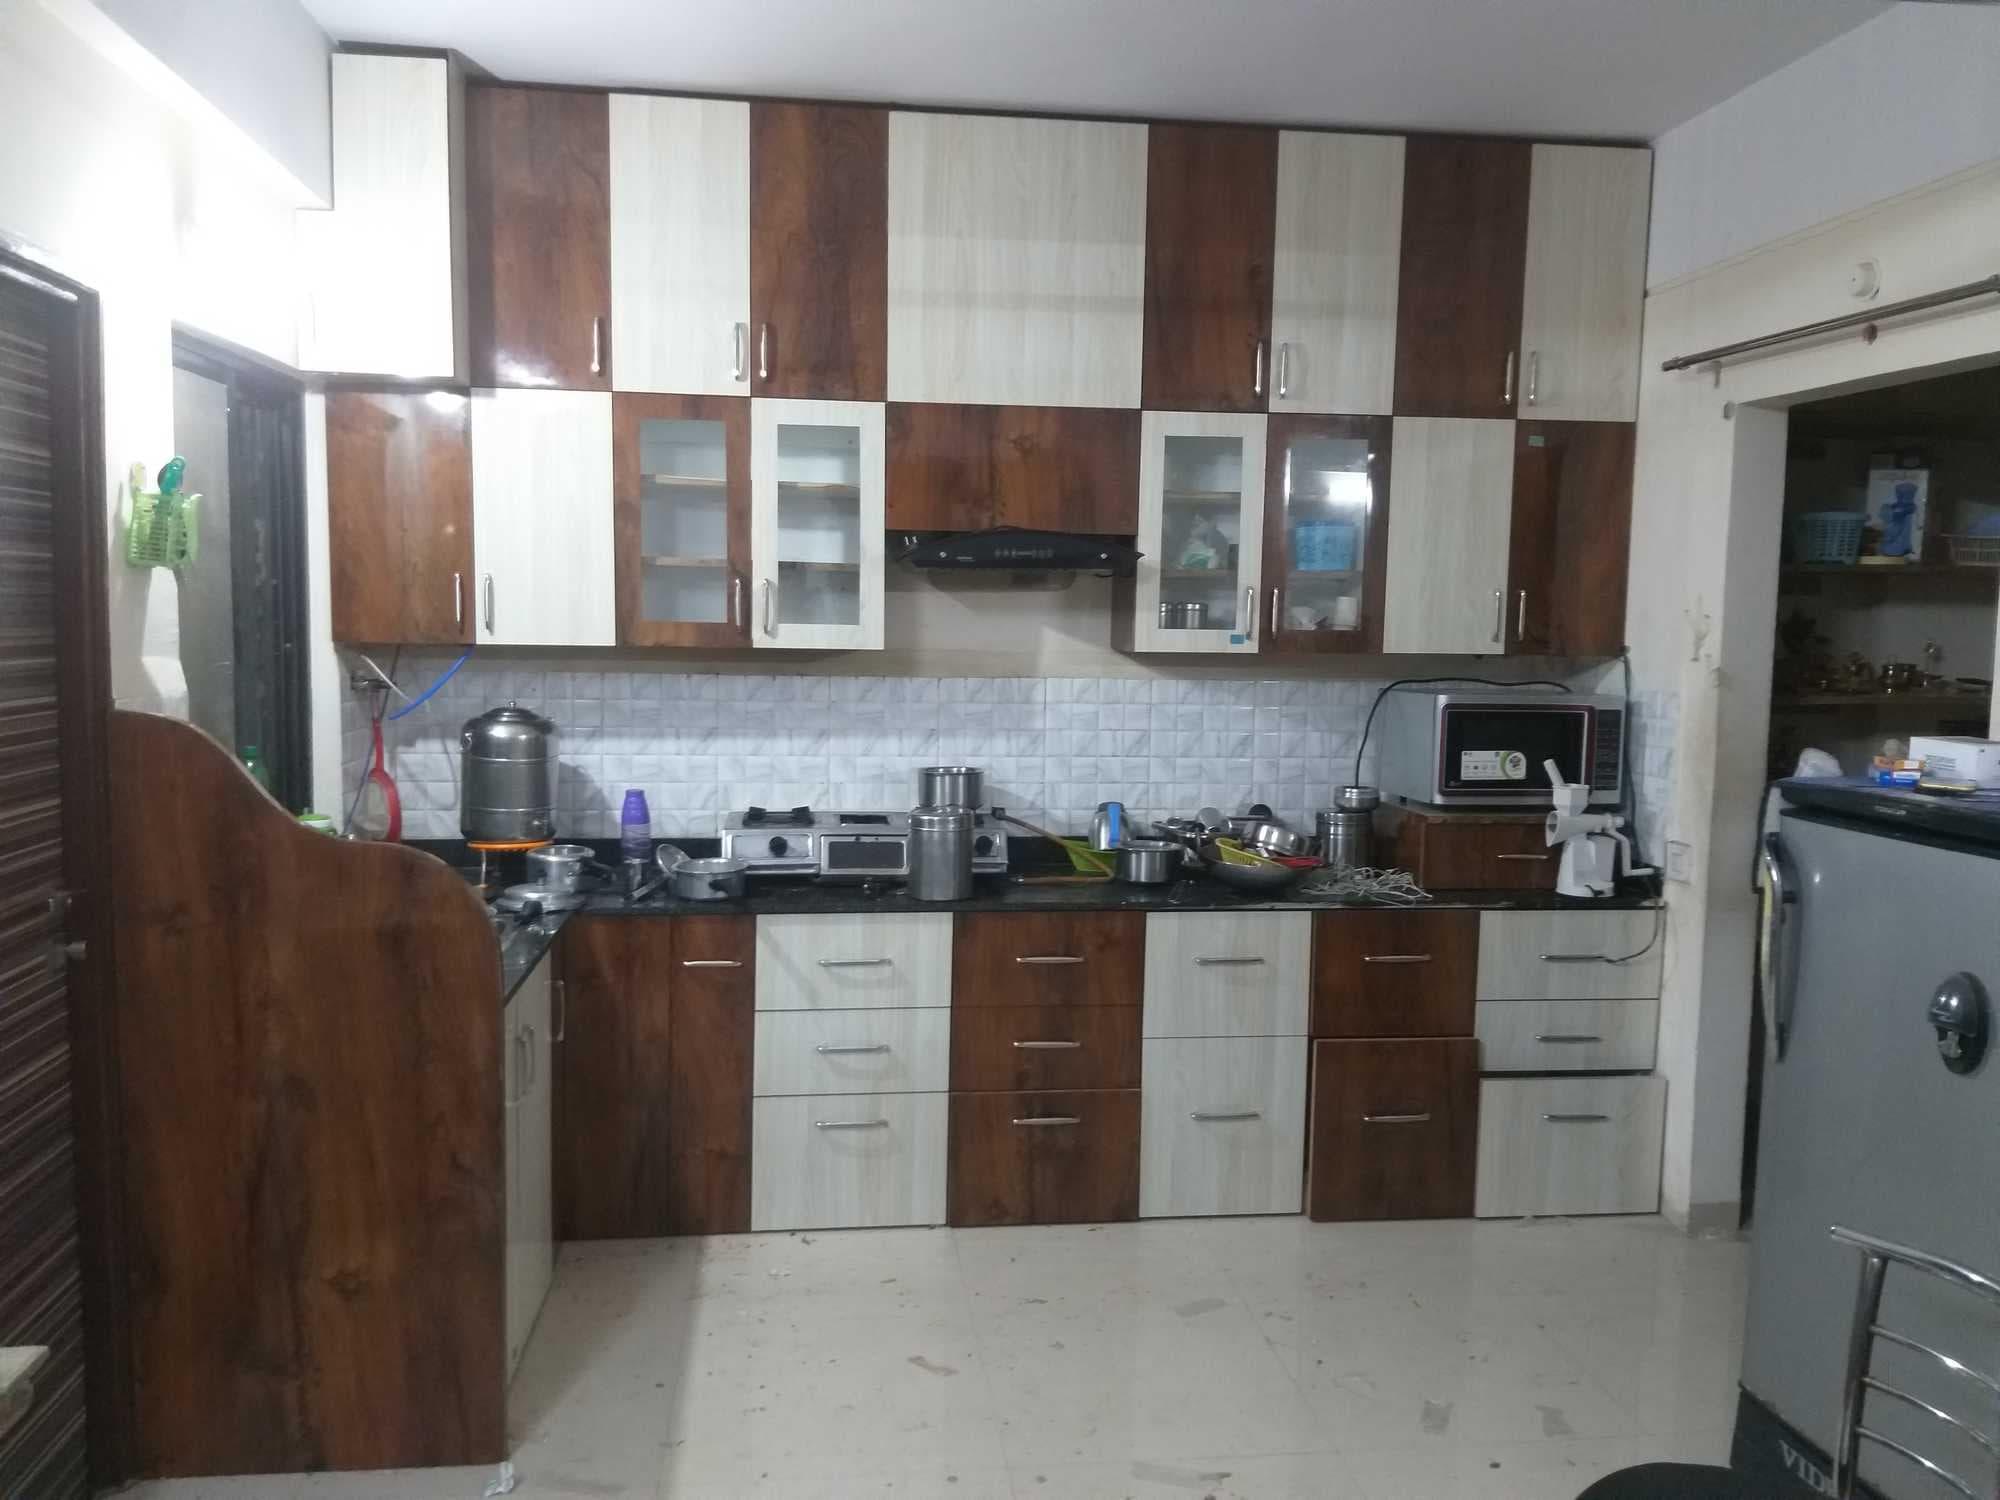 Top 10 Modular Kitchen Repair & Services in Indore - Best